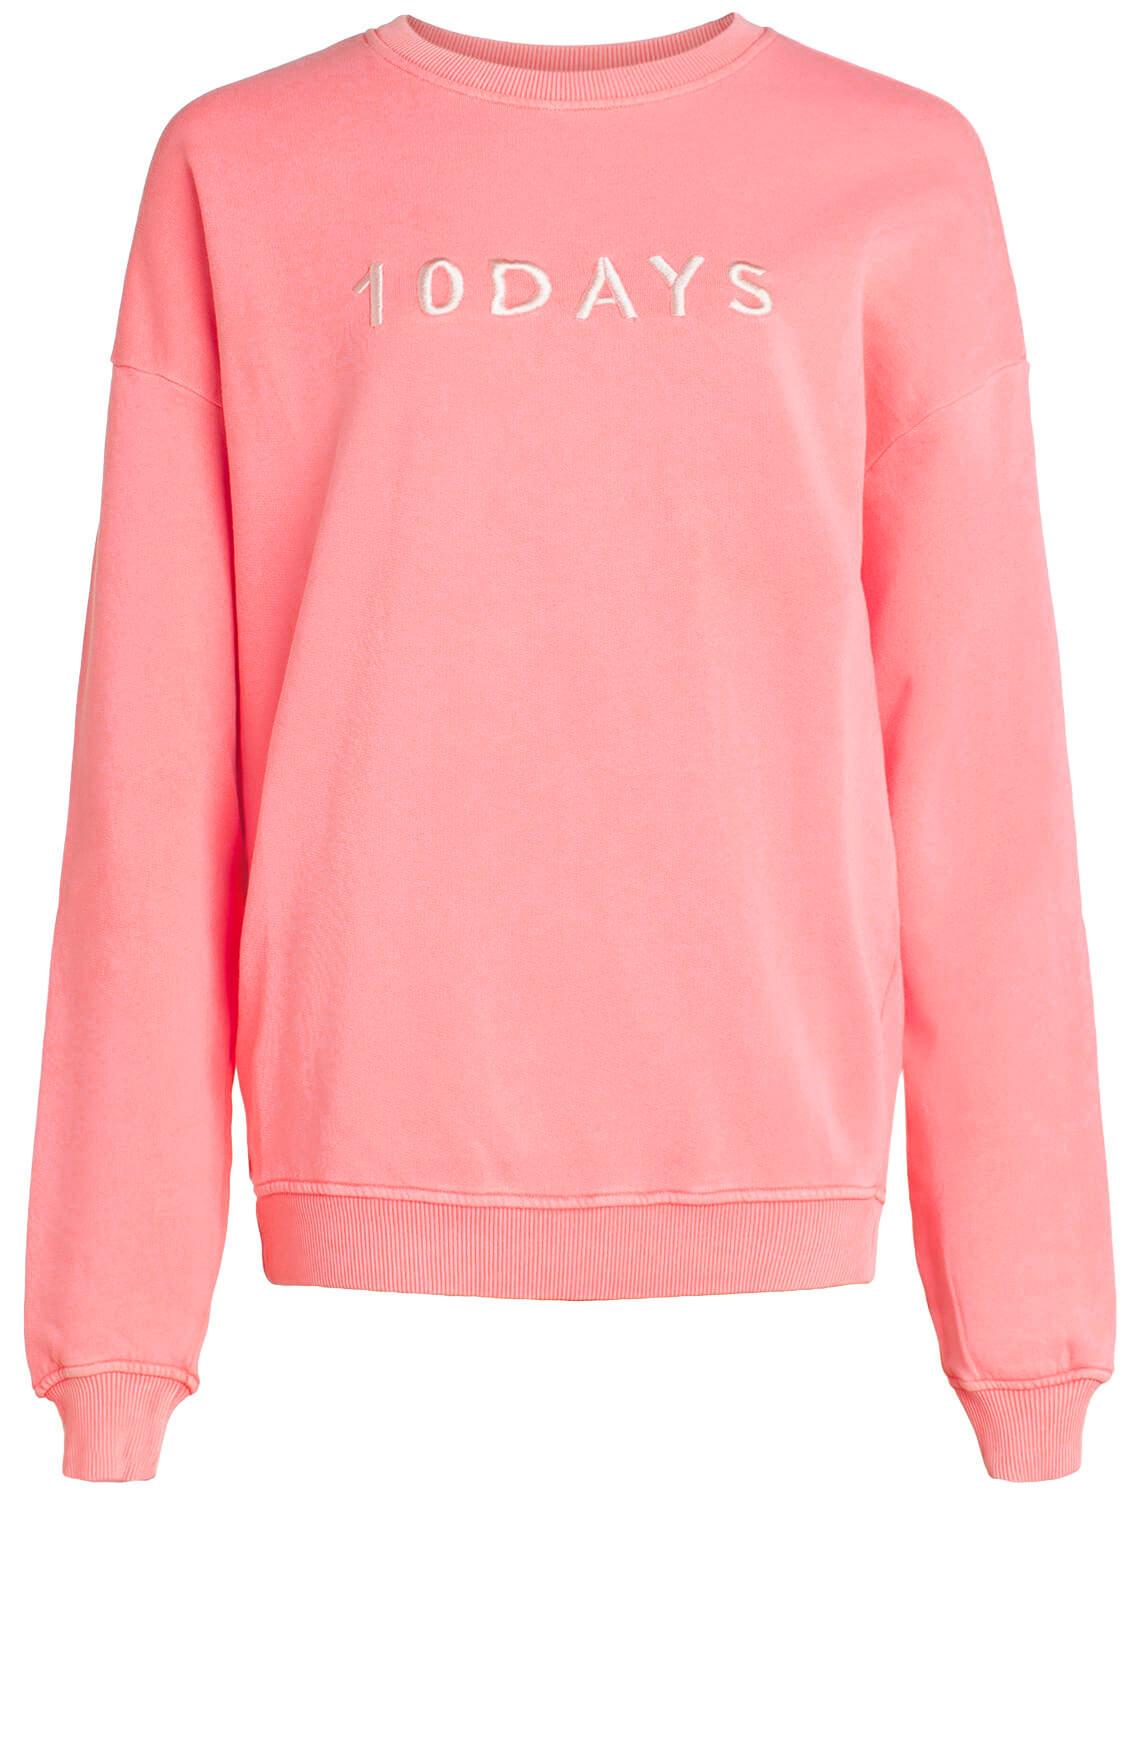 10 Days Dames Sweater met tekst roze